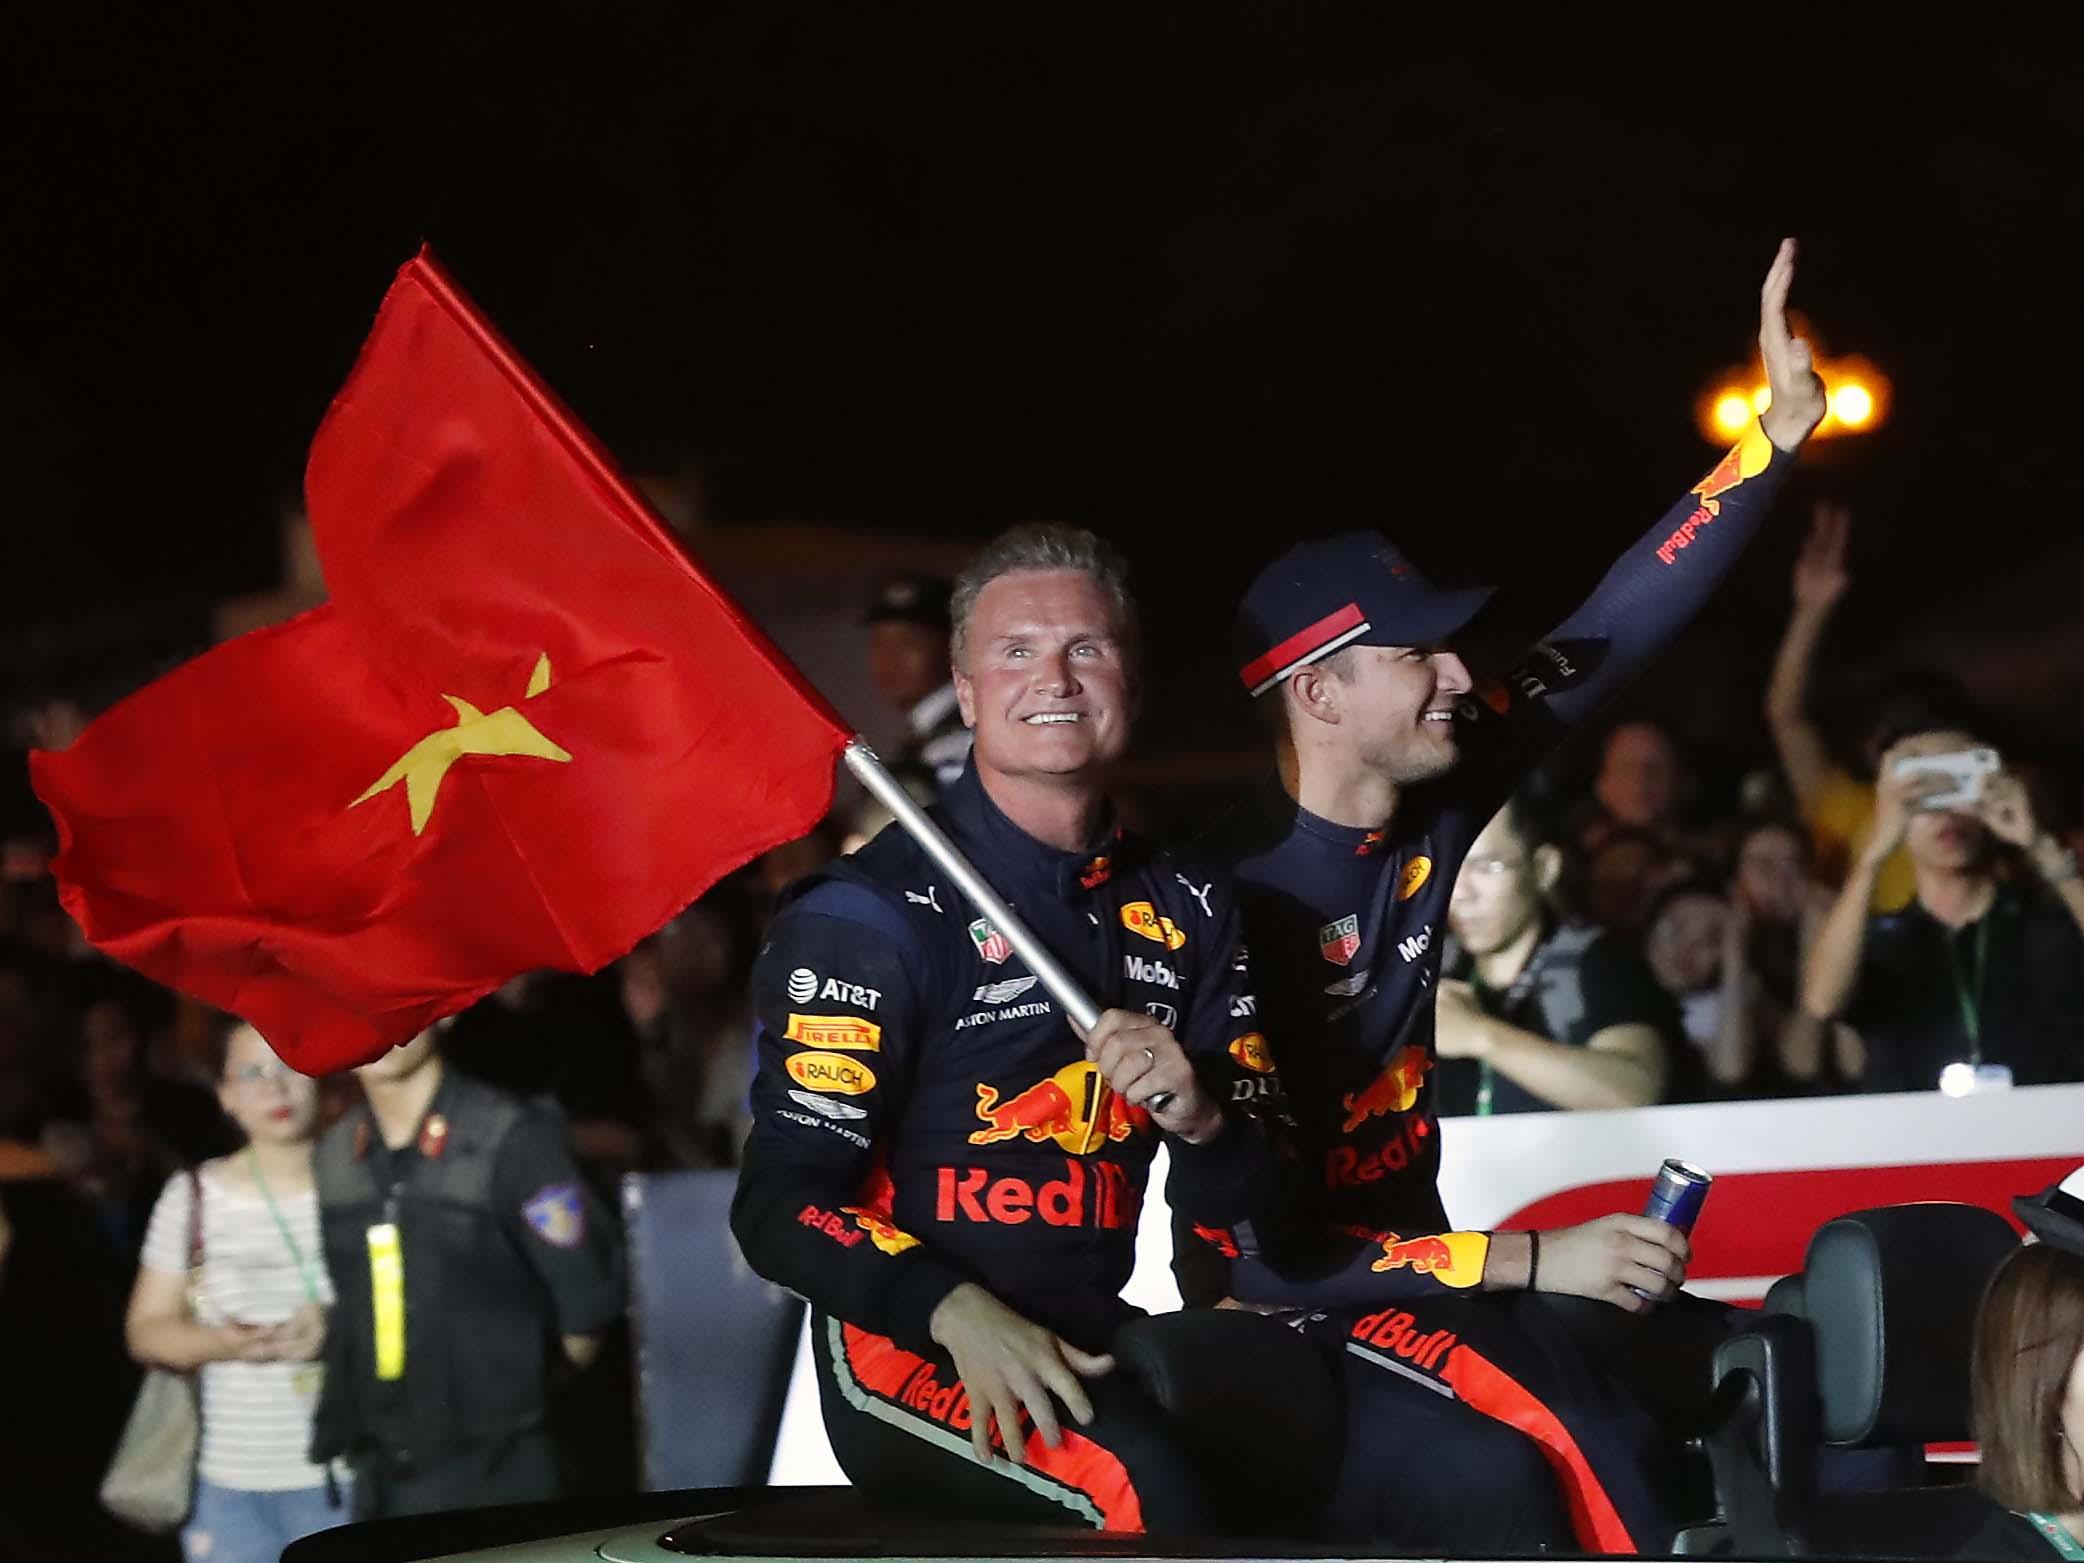 In the pitlane - Good night Vietnam